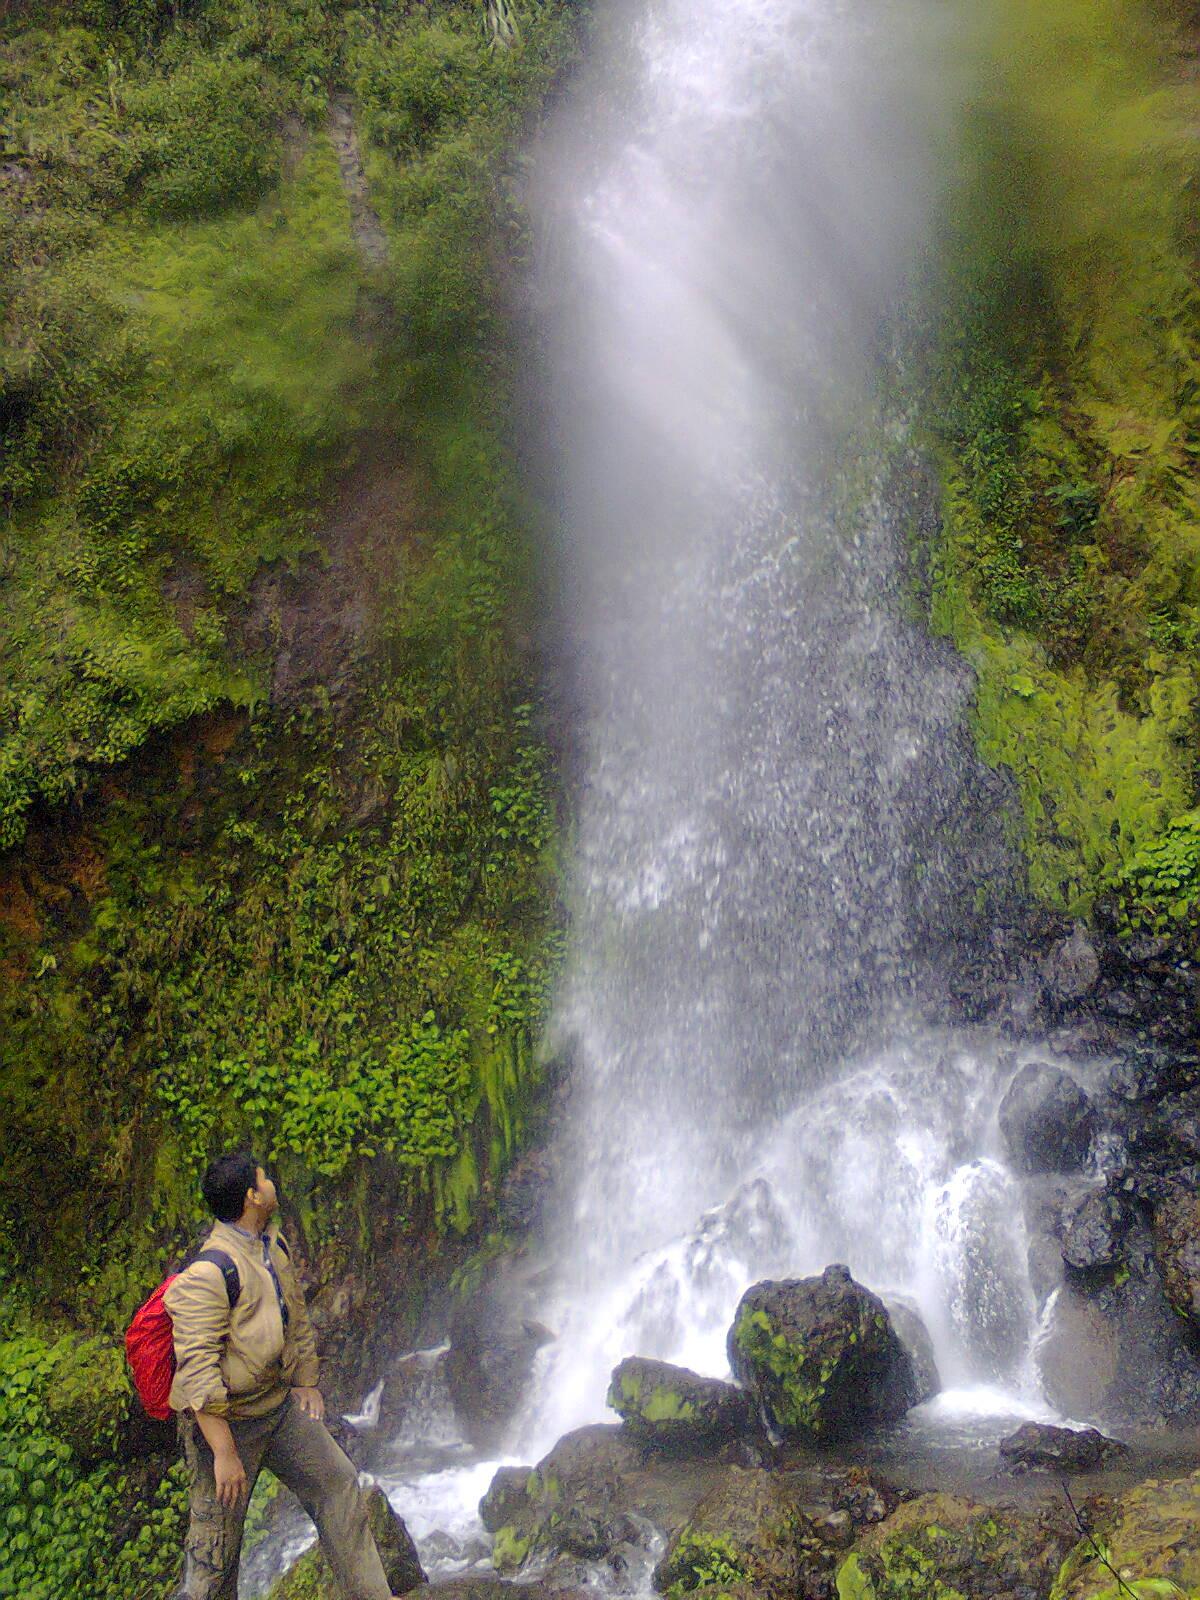 Kamu Wajib Kunjungi 5 Tempat Wisata Wonogiri Air Terjun Setren